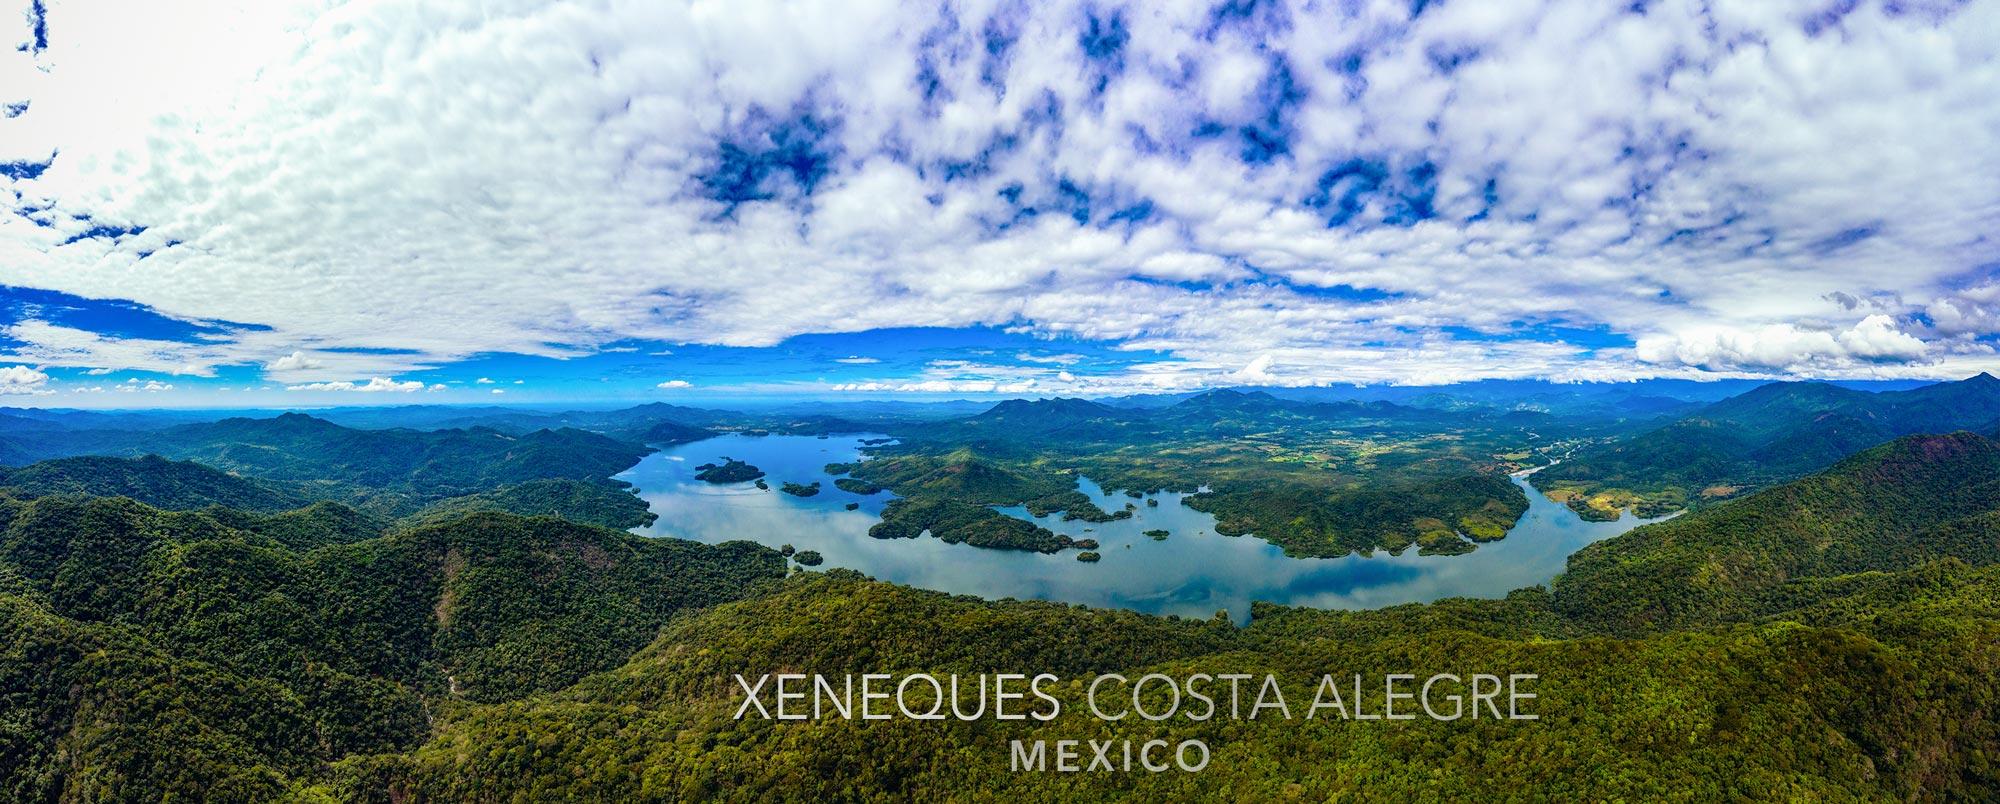 Cajon de Peñas - Xeneques - Tomatlan - Costalegre - Jalisco - Mexico